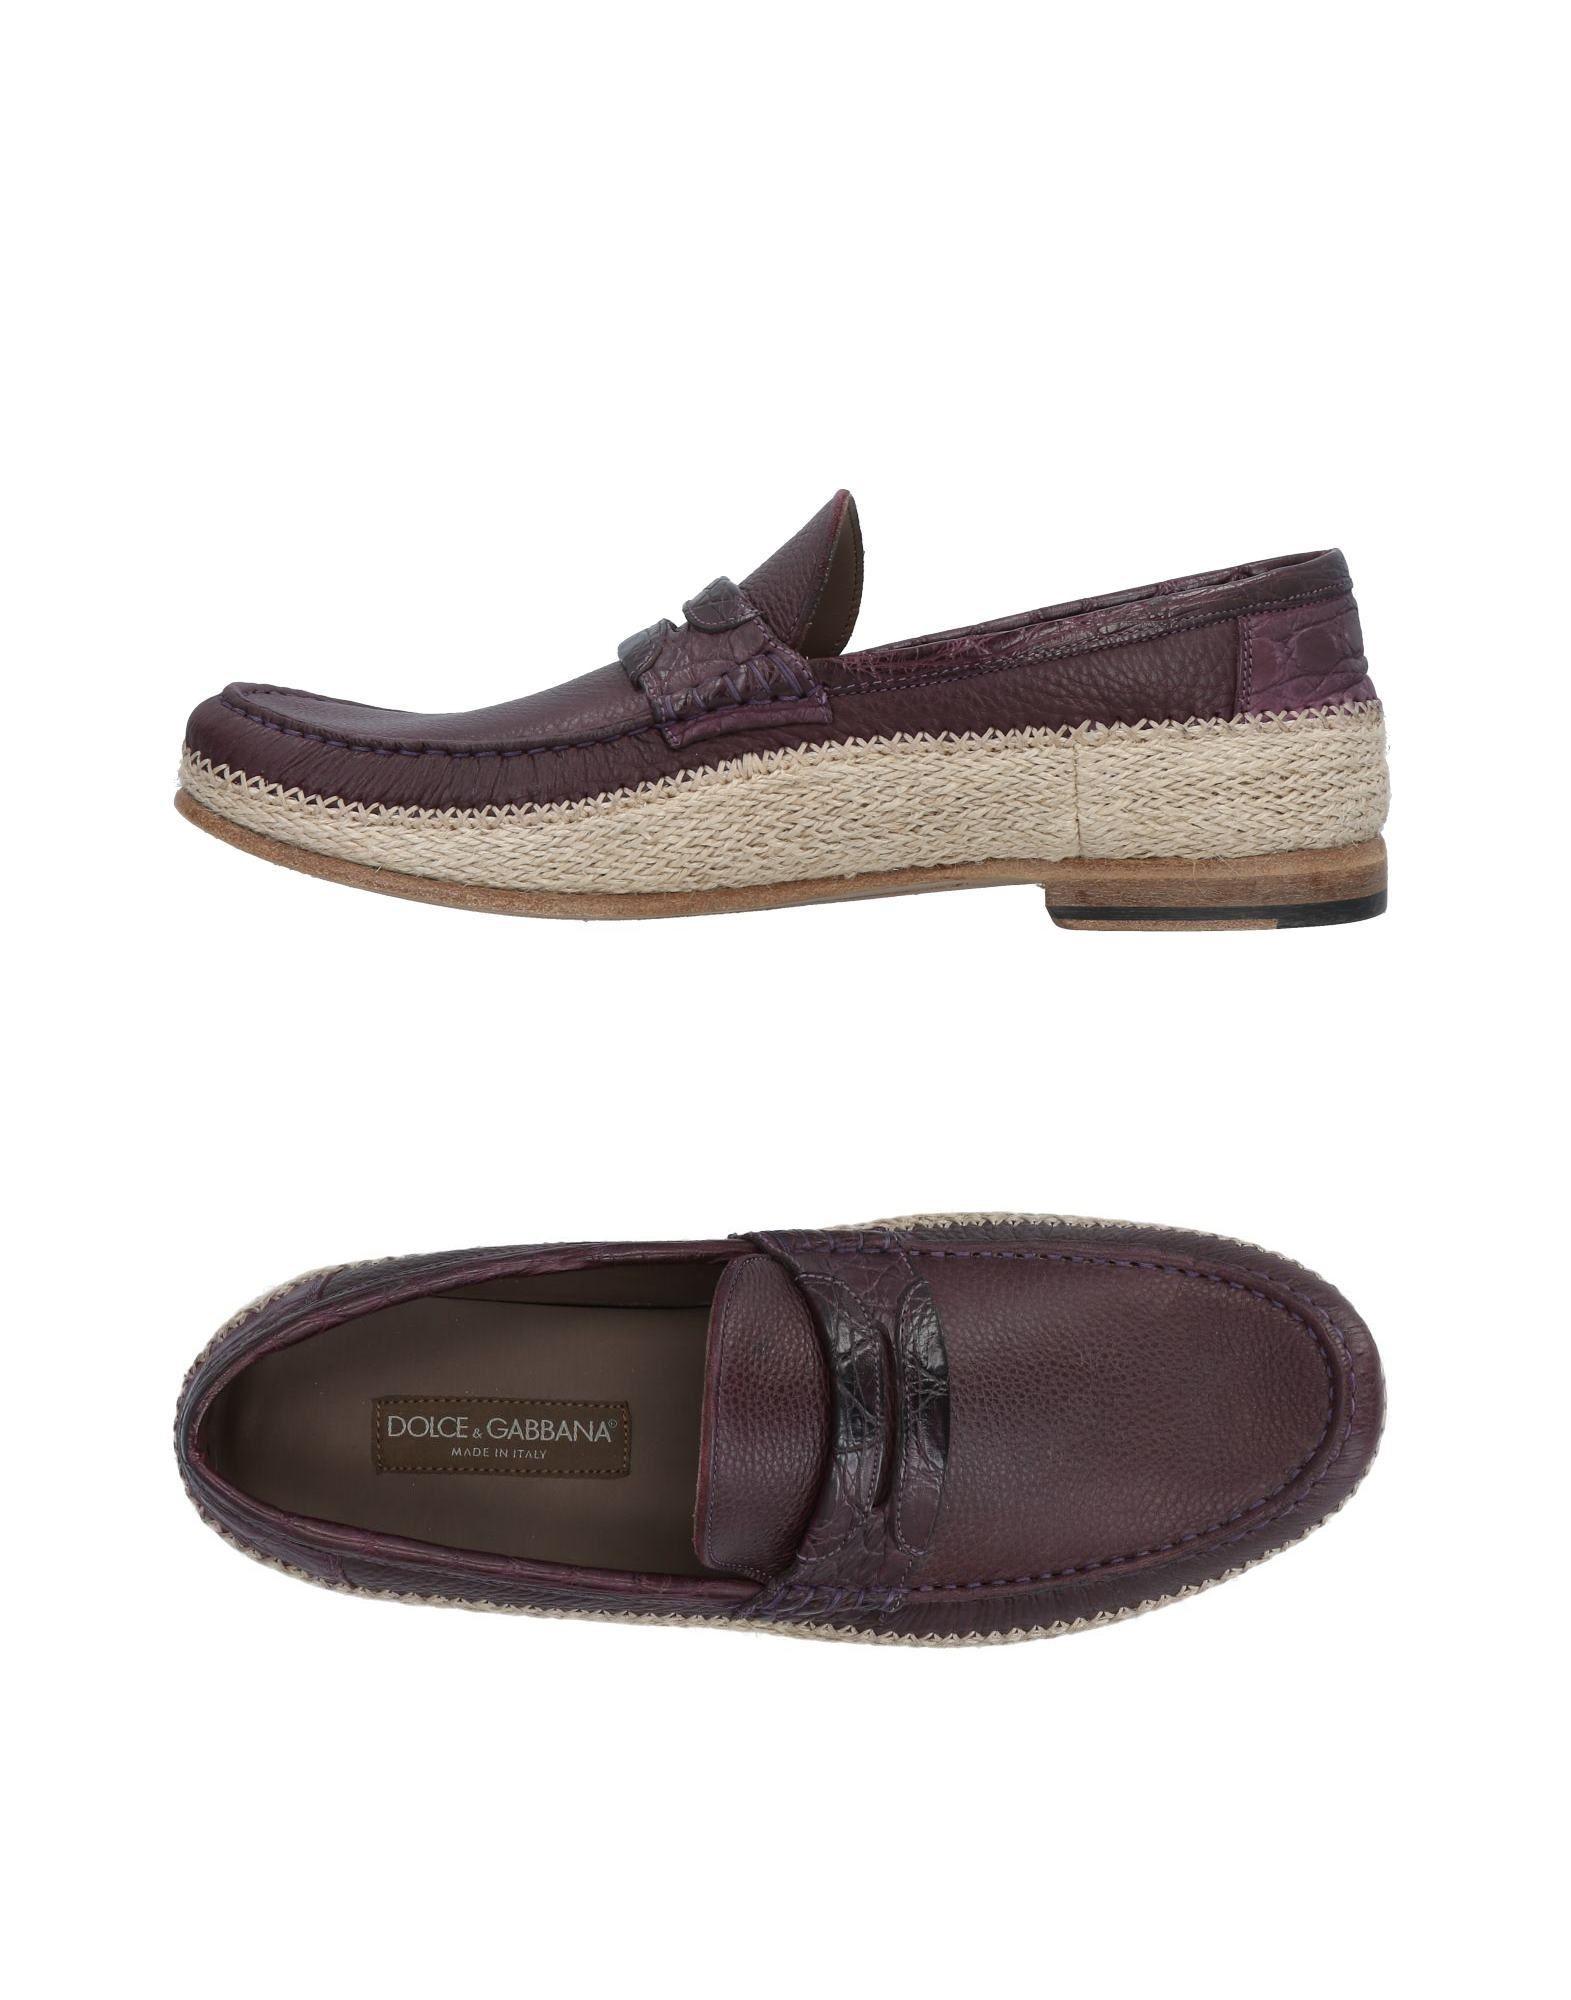 Dolce & Gabbana Mokassins Herren  11487908NJ Gute Qualität beliebte Schuhe